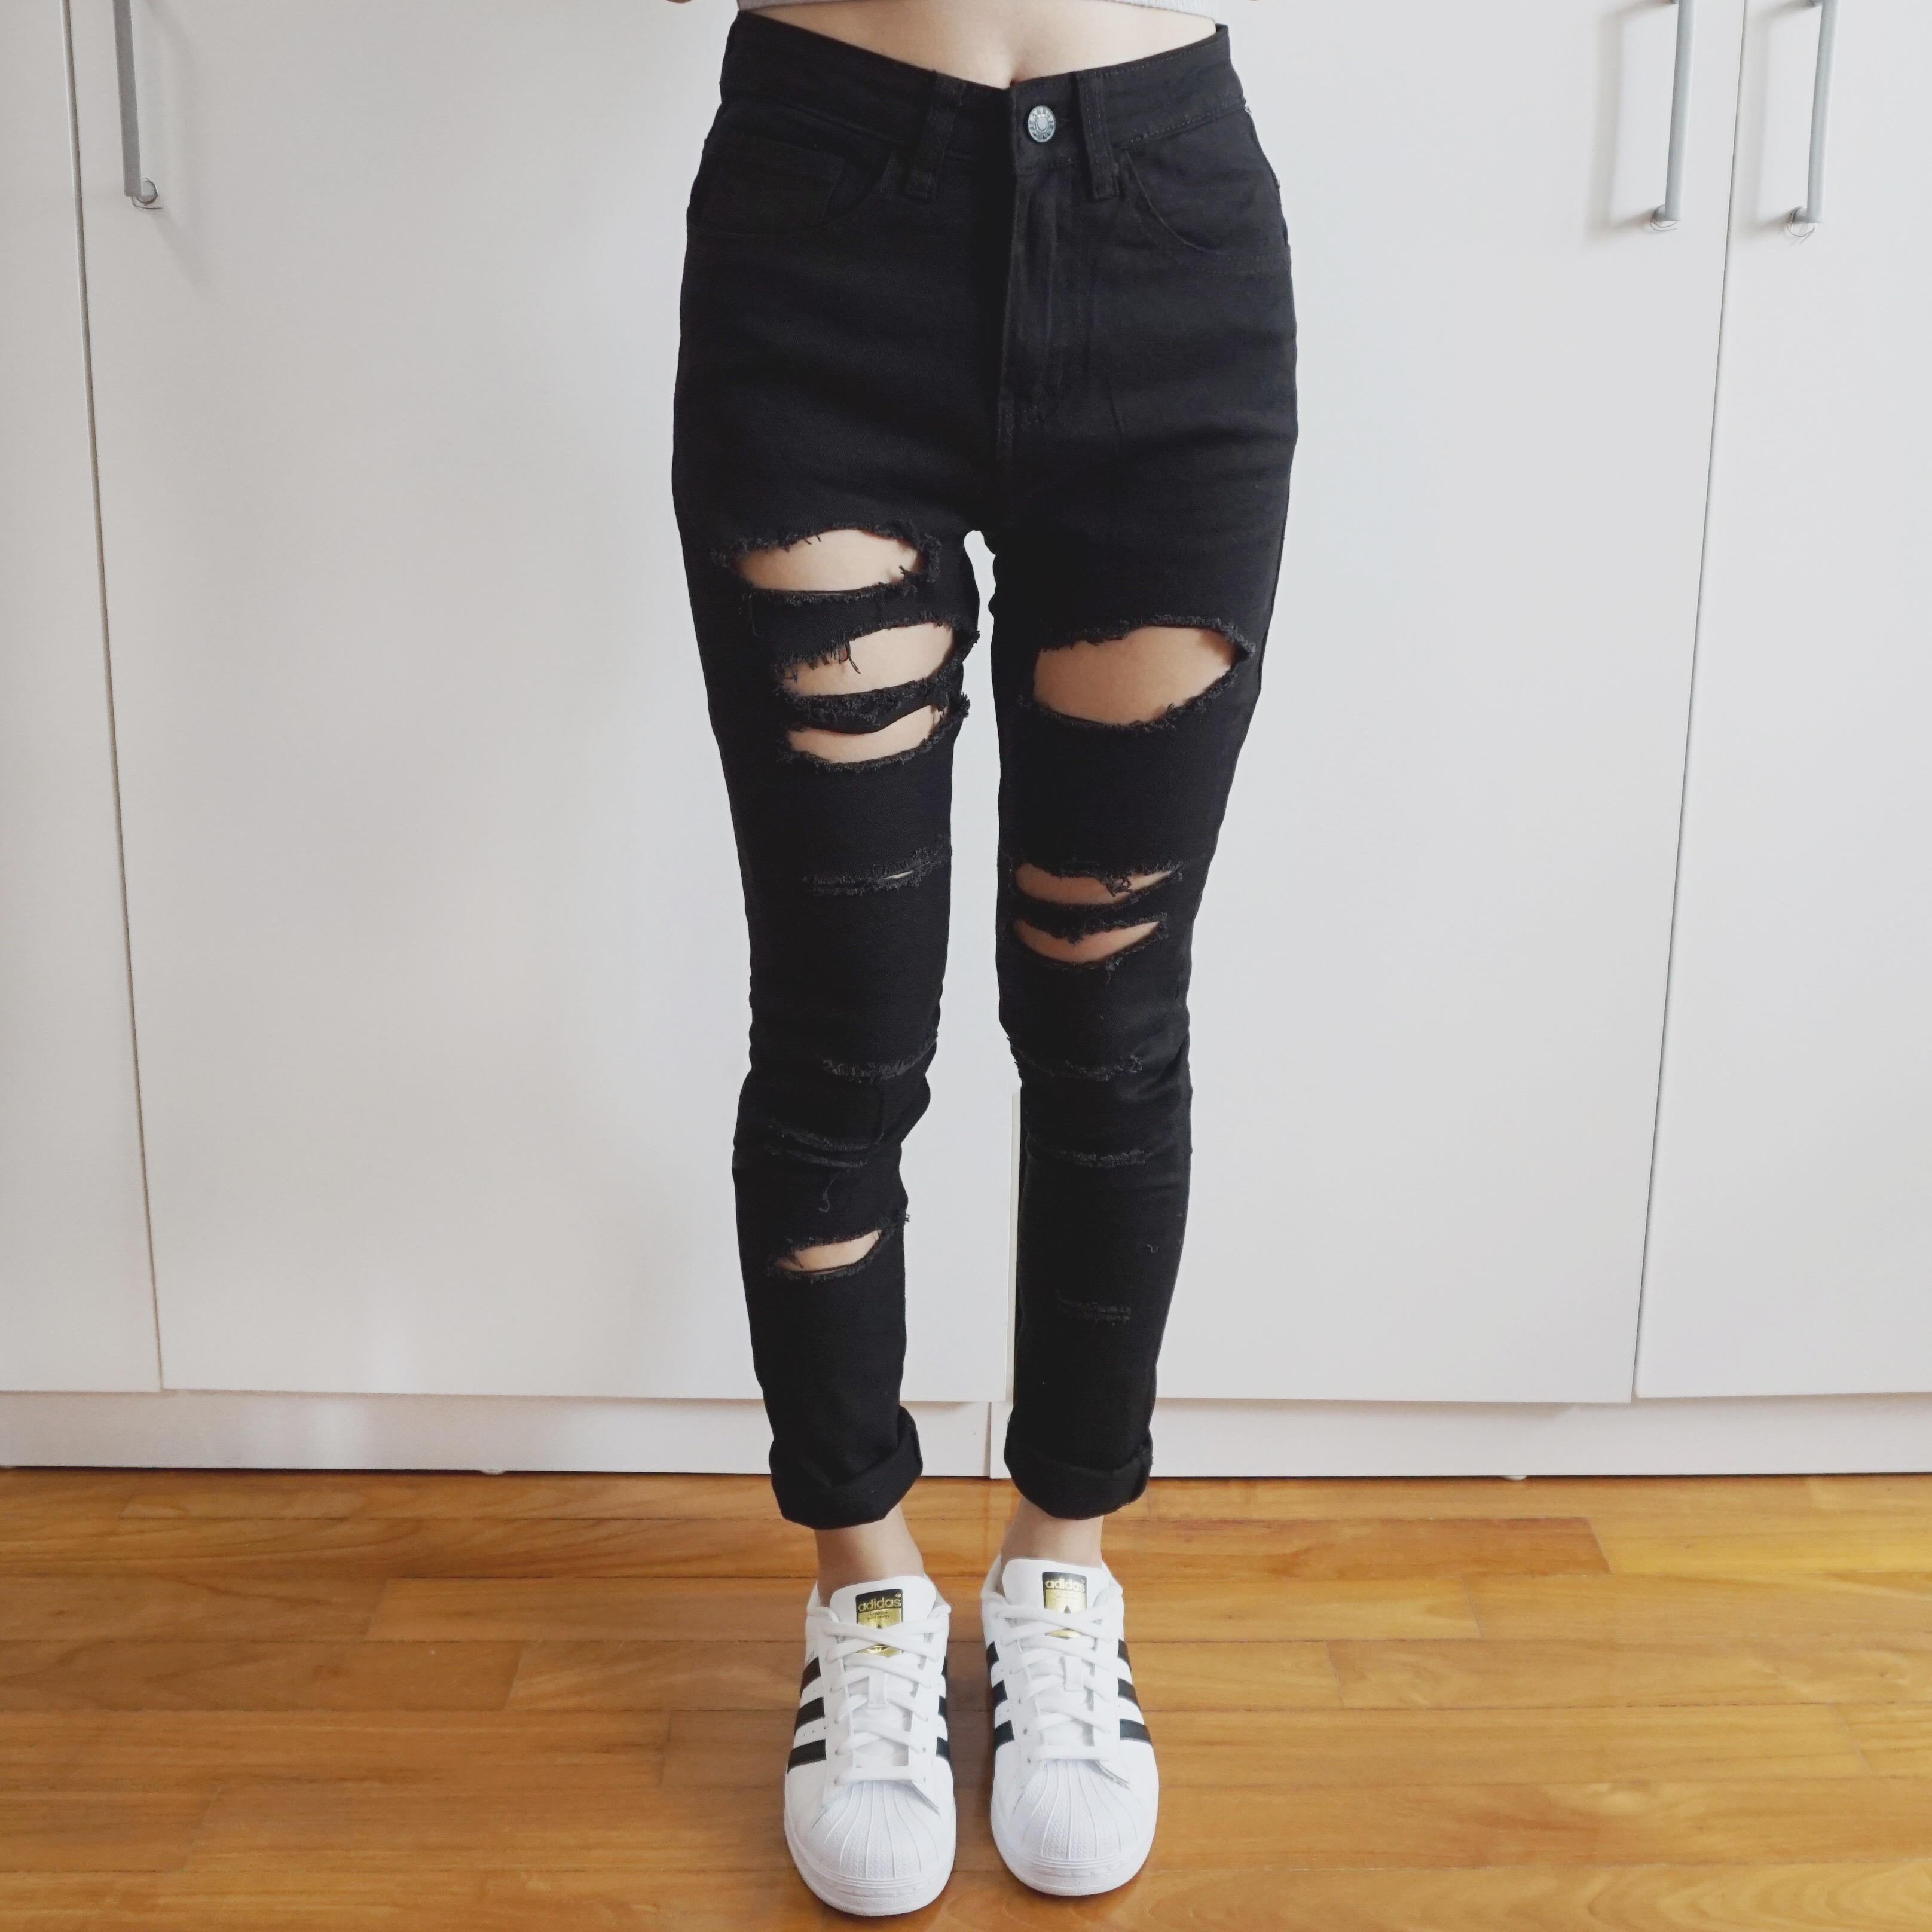 26c5c9302d77 Destroyed Ripped High Waist Skinny Jeans (Black) · Megoosta Fashion ...